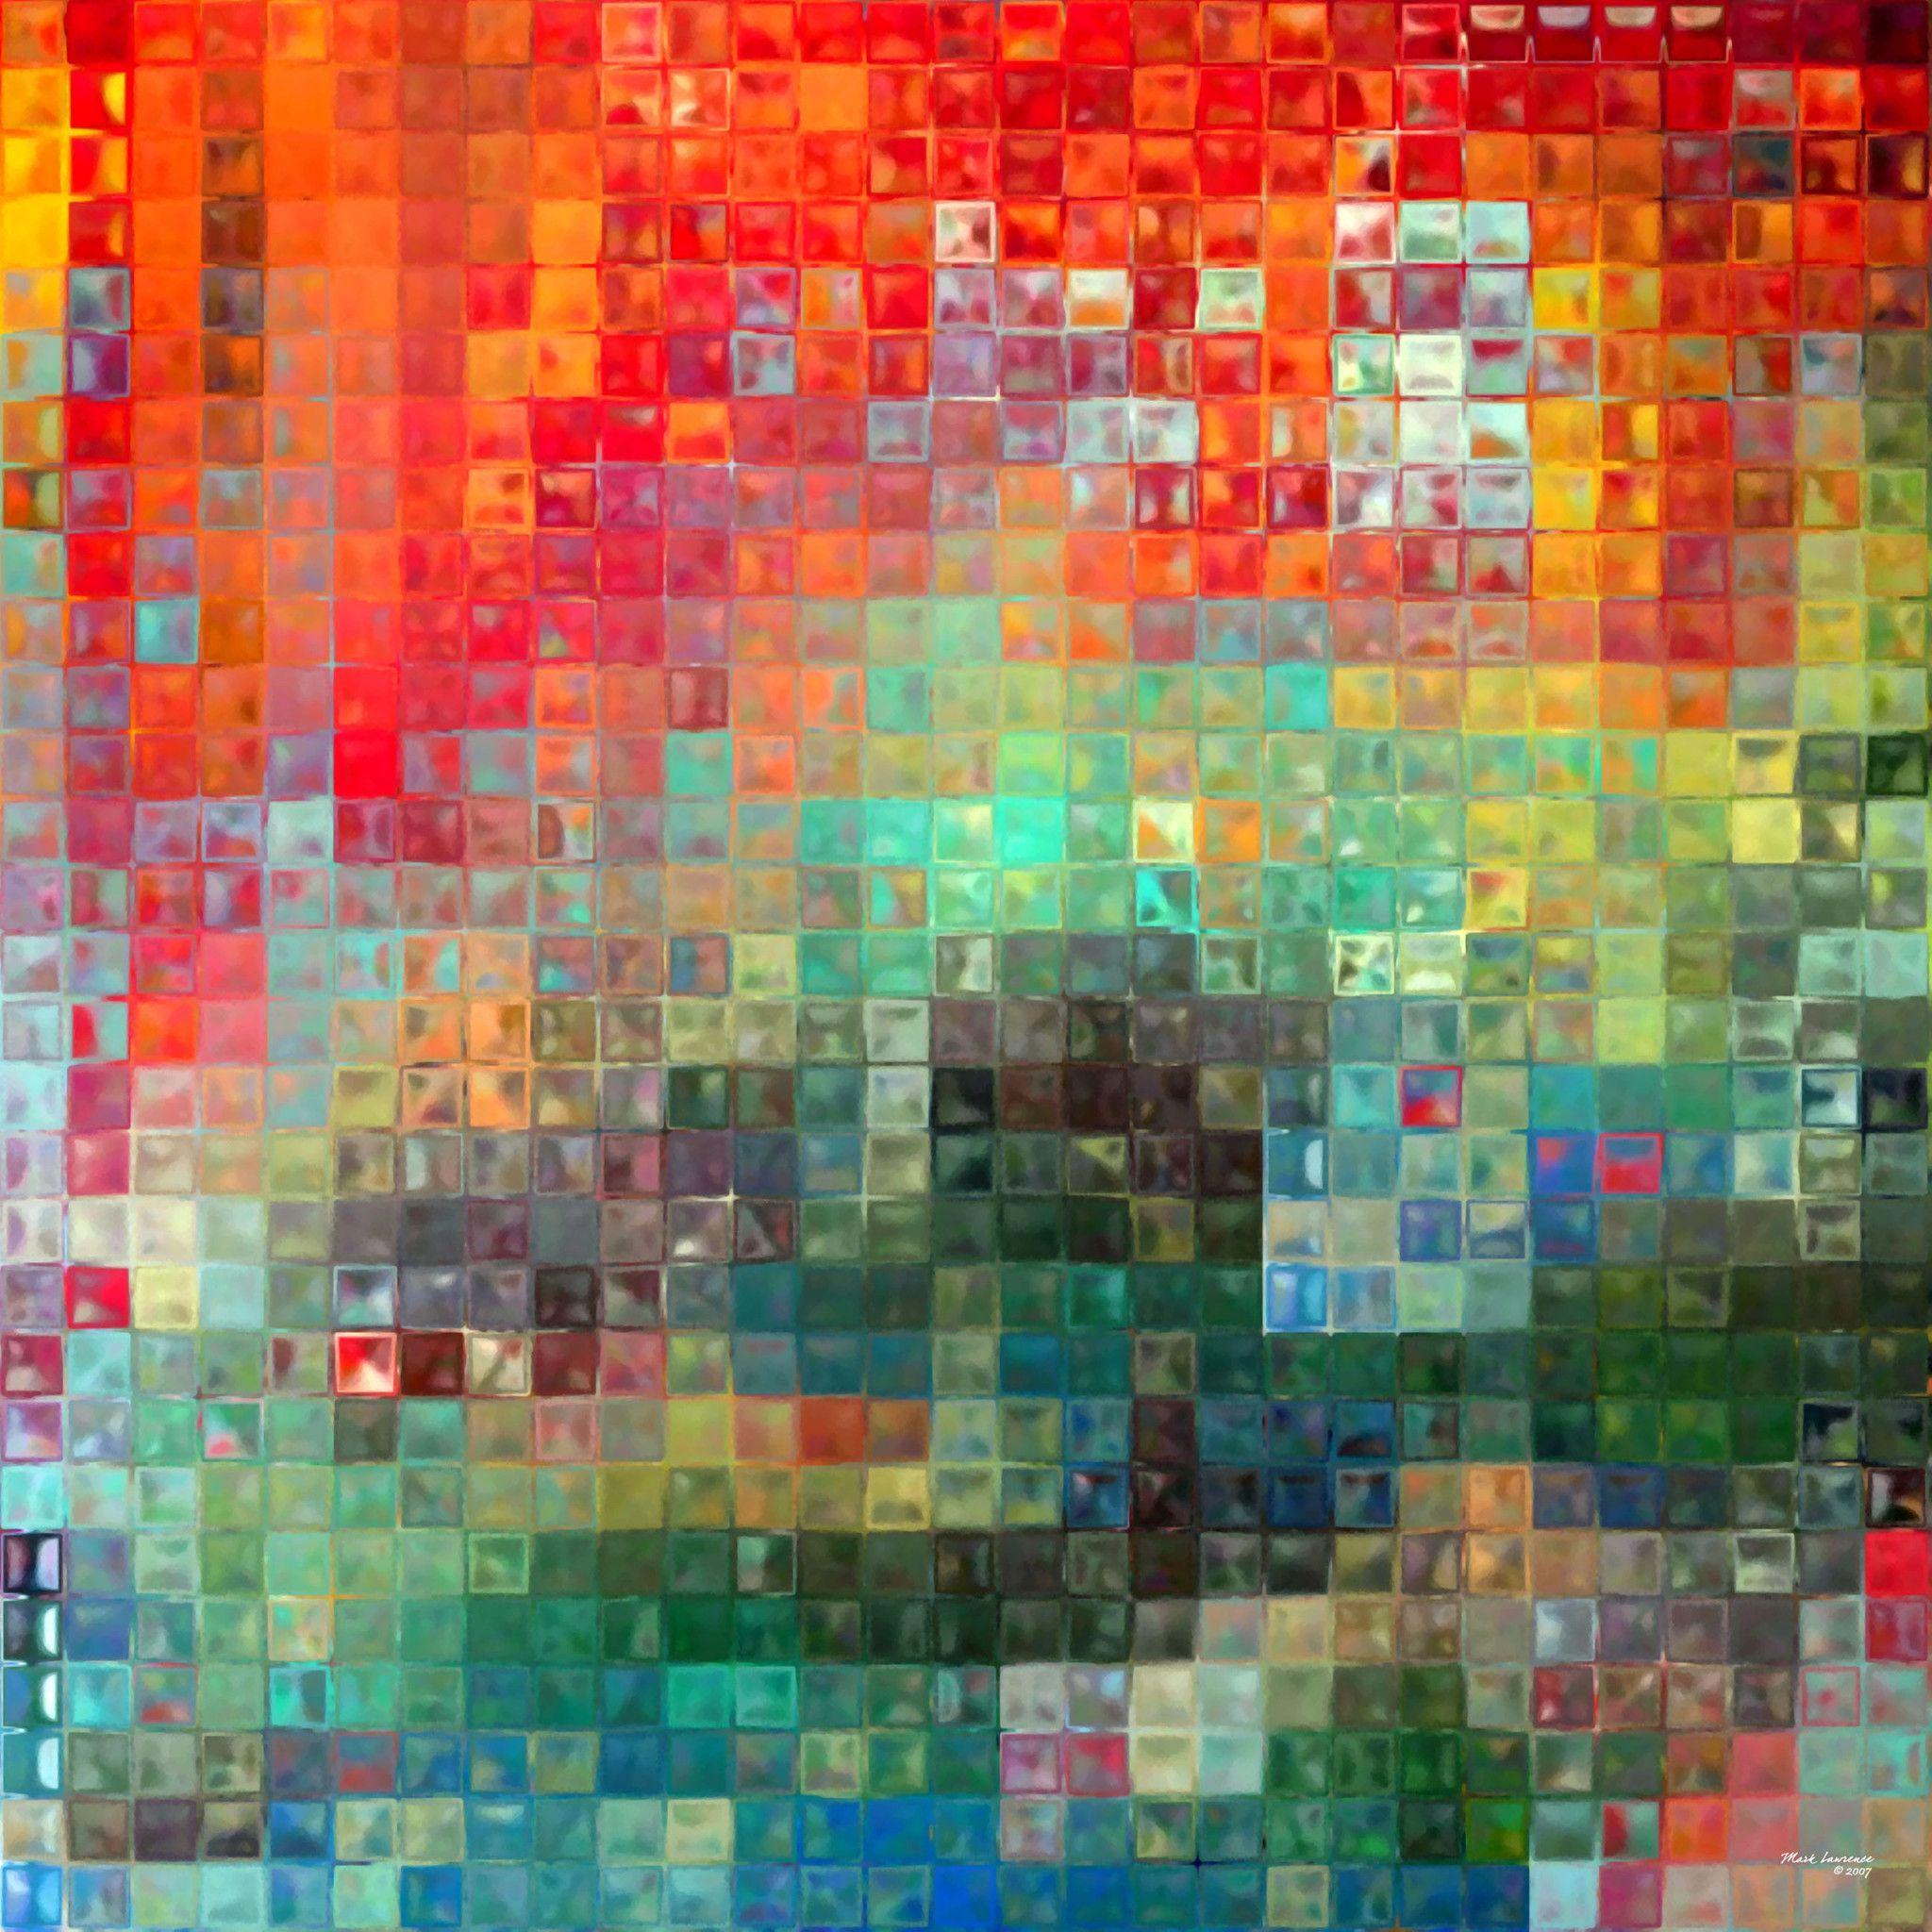 The Modern Tile Art Technique Is Similar To The Grid Technique